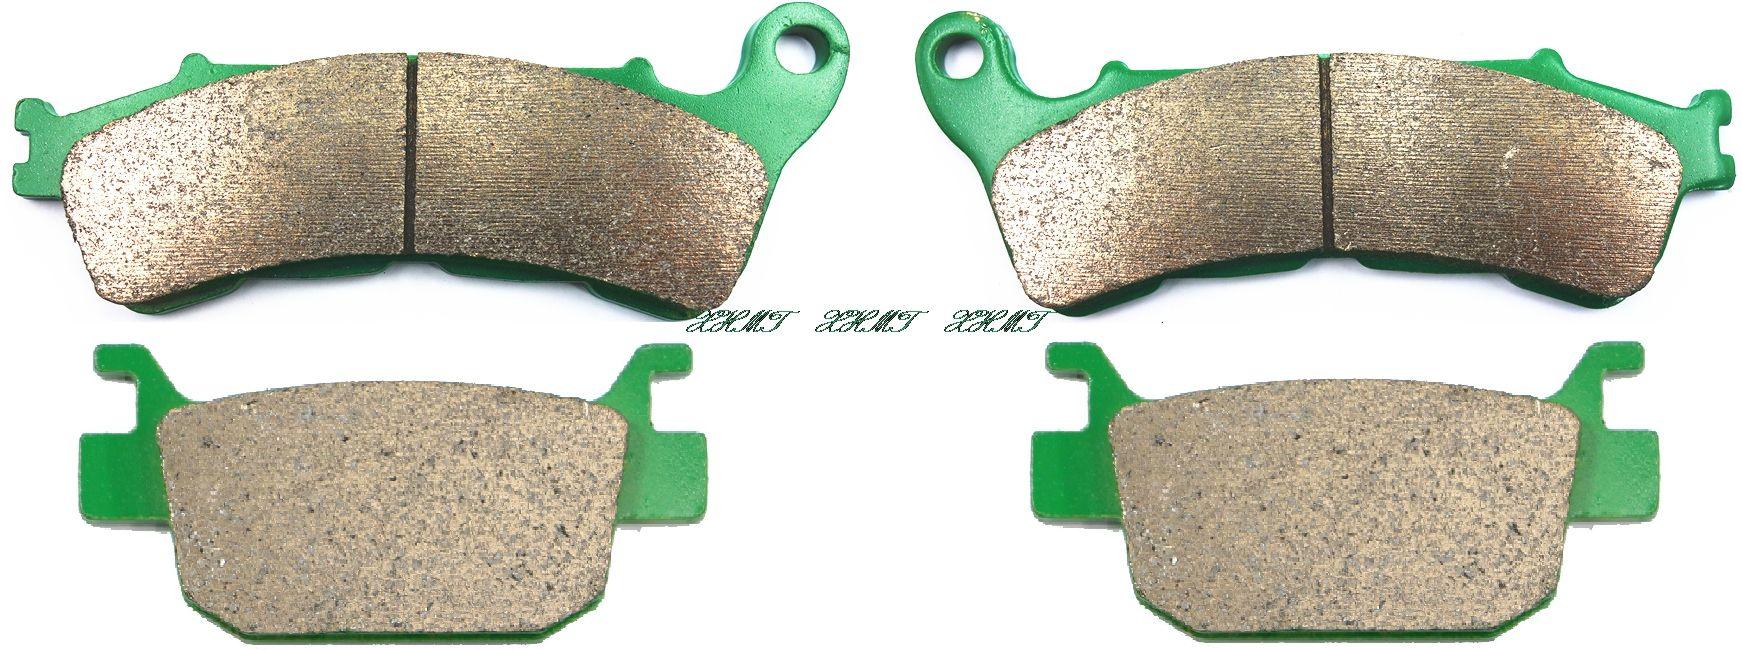 Disc Brake Pads Set for HONDA NSS250 NSS 250 FORZA EX X 2005 06-08/ SH300 SH 300 i 2006 2007 2008 2009 2010 2011 2012 2013 2014